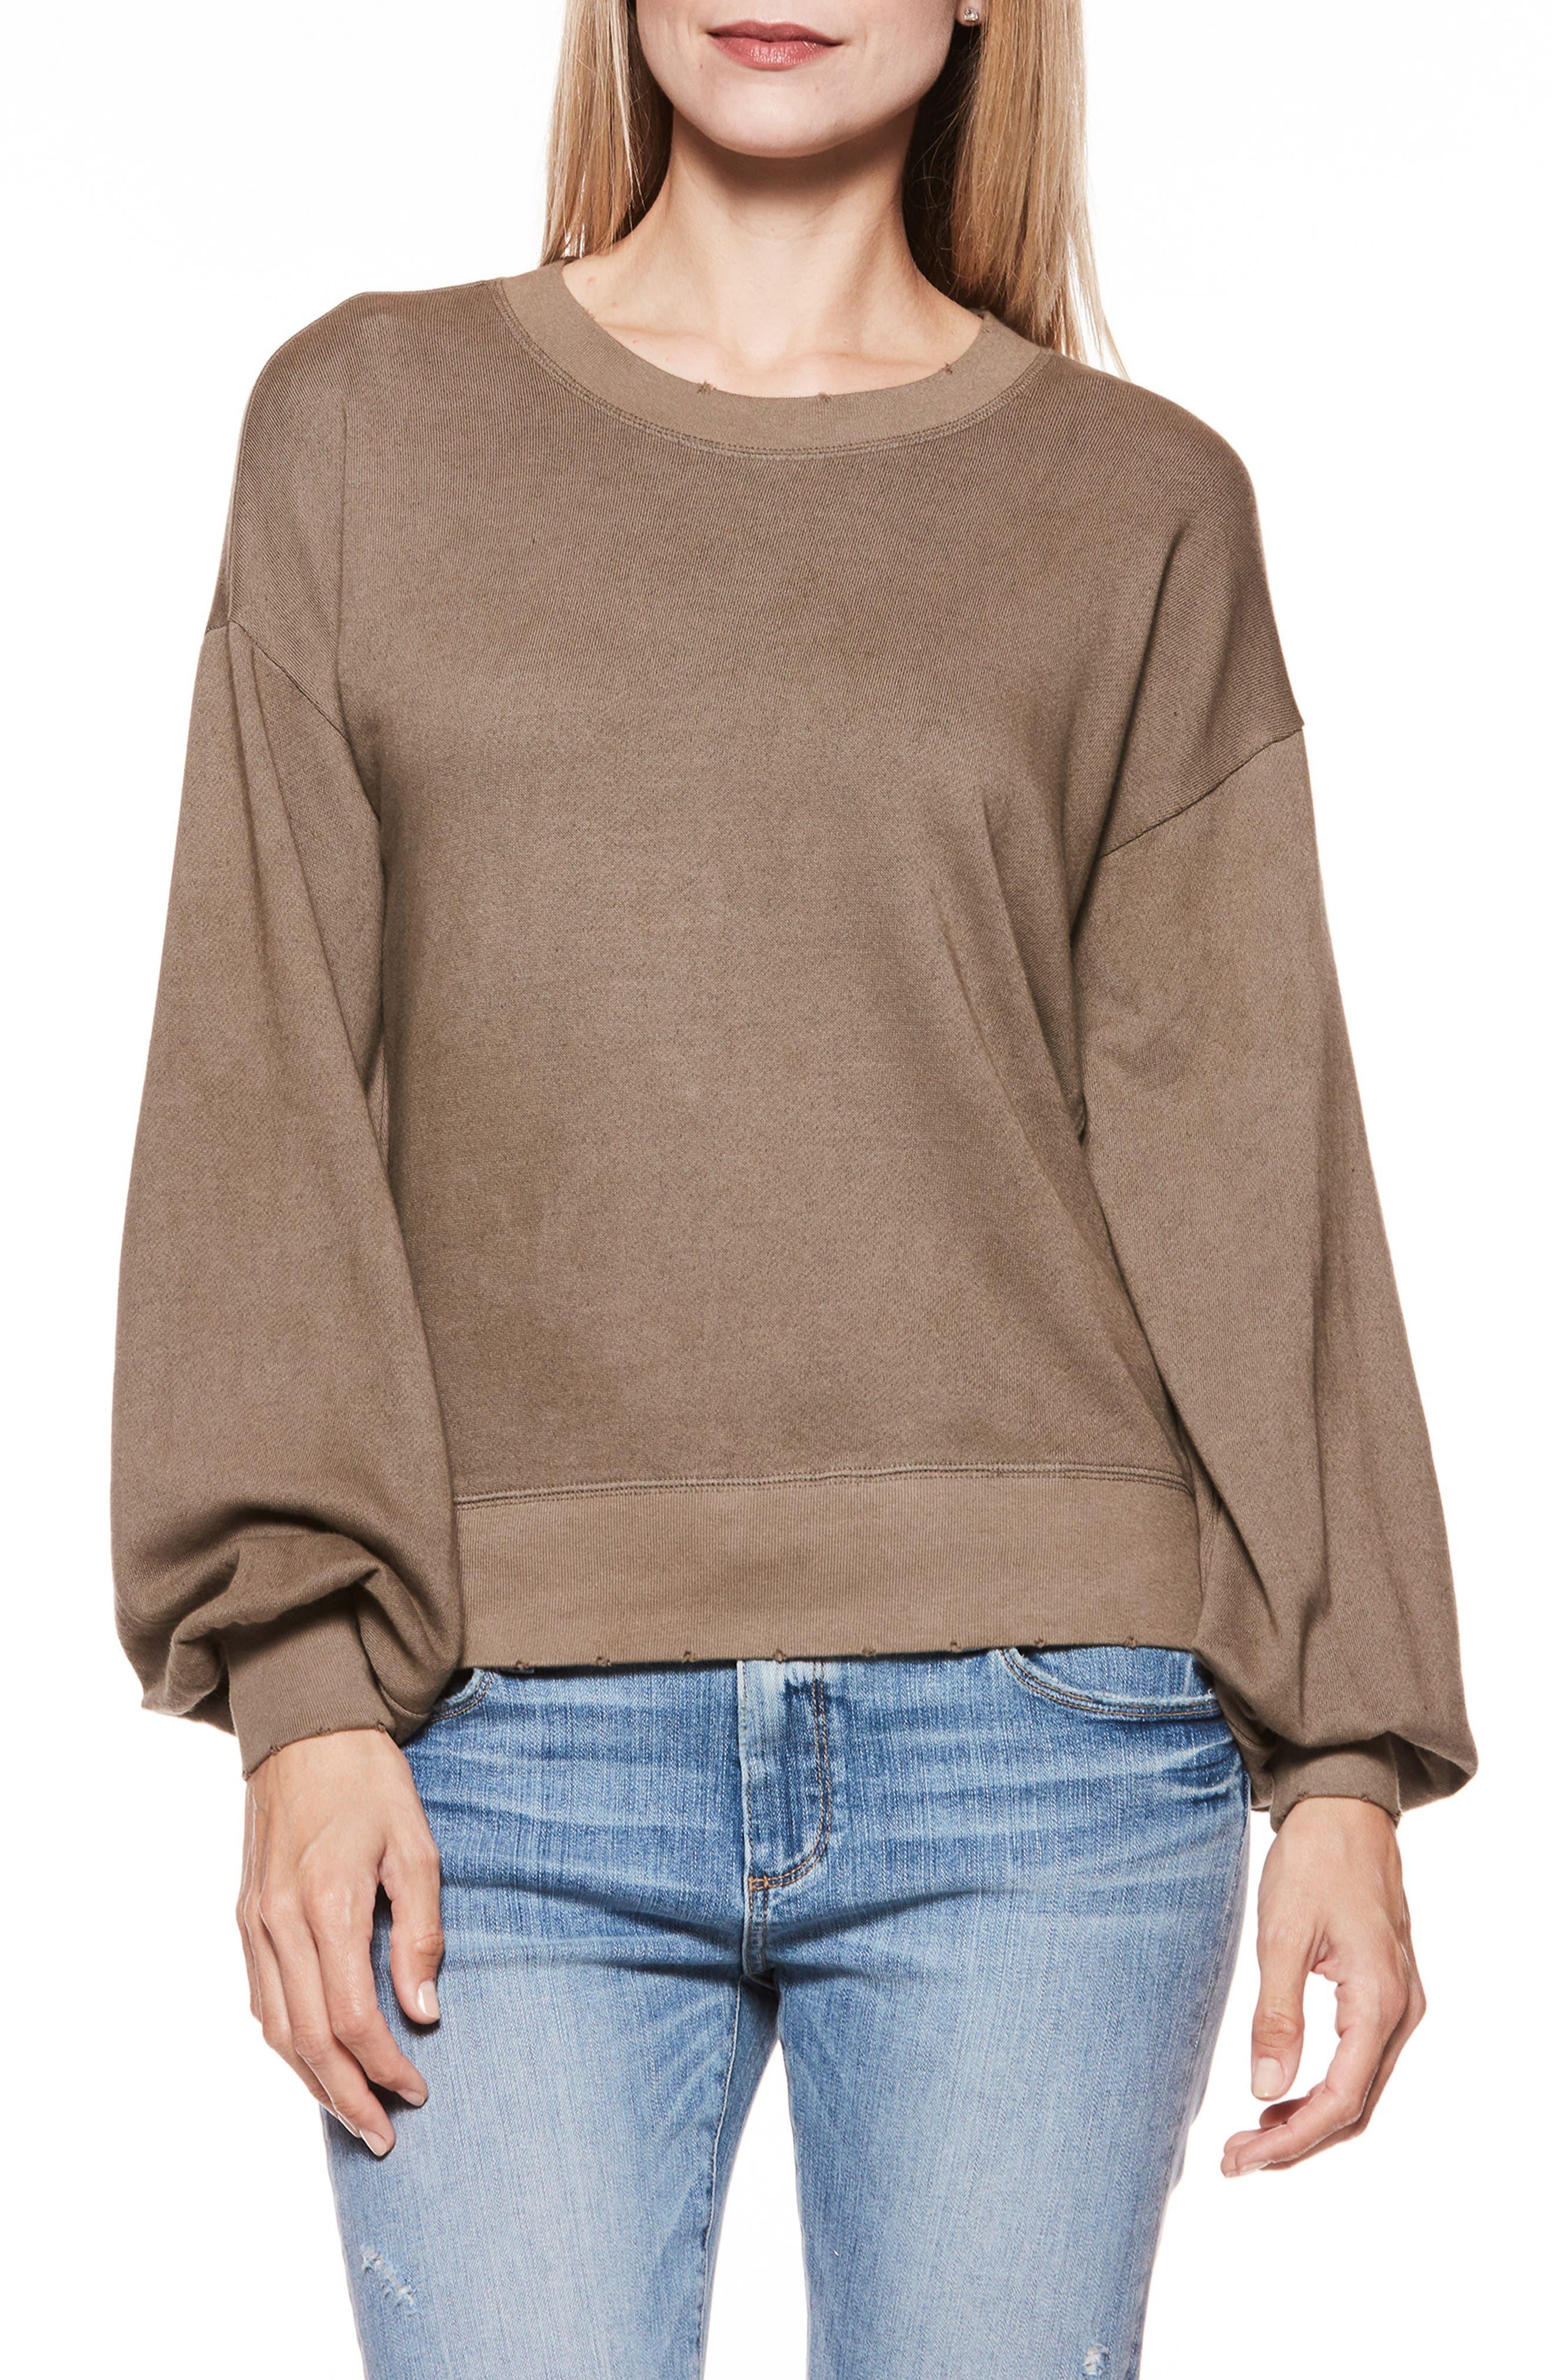 Cortlynn Sweatshirt,                         Main,                         color, Tanned Olive